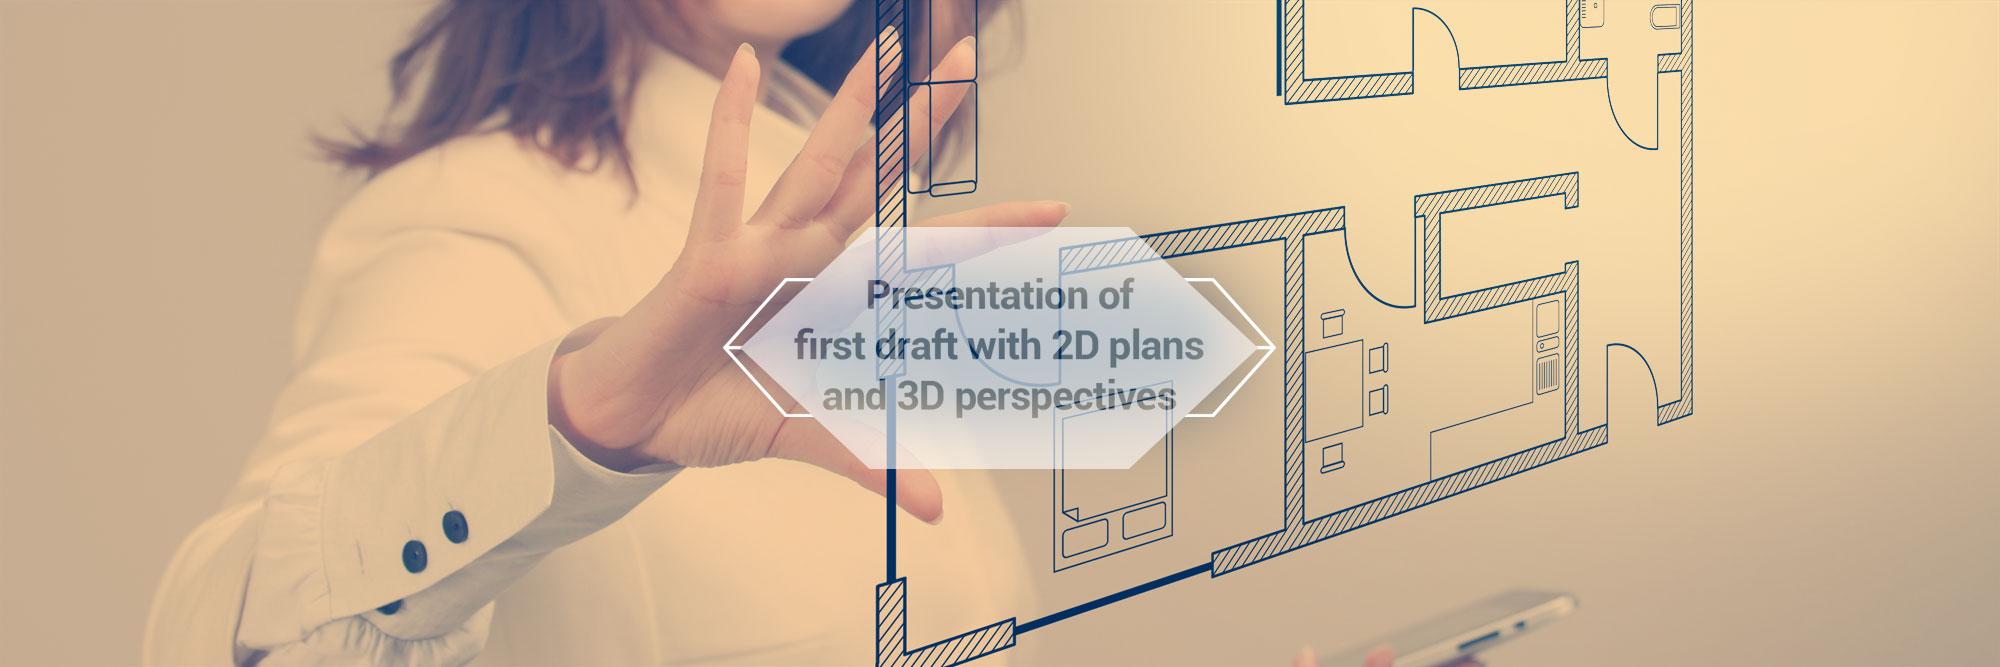 Presentation of first draft